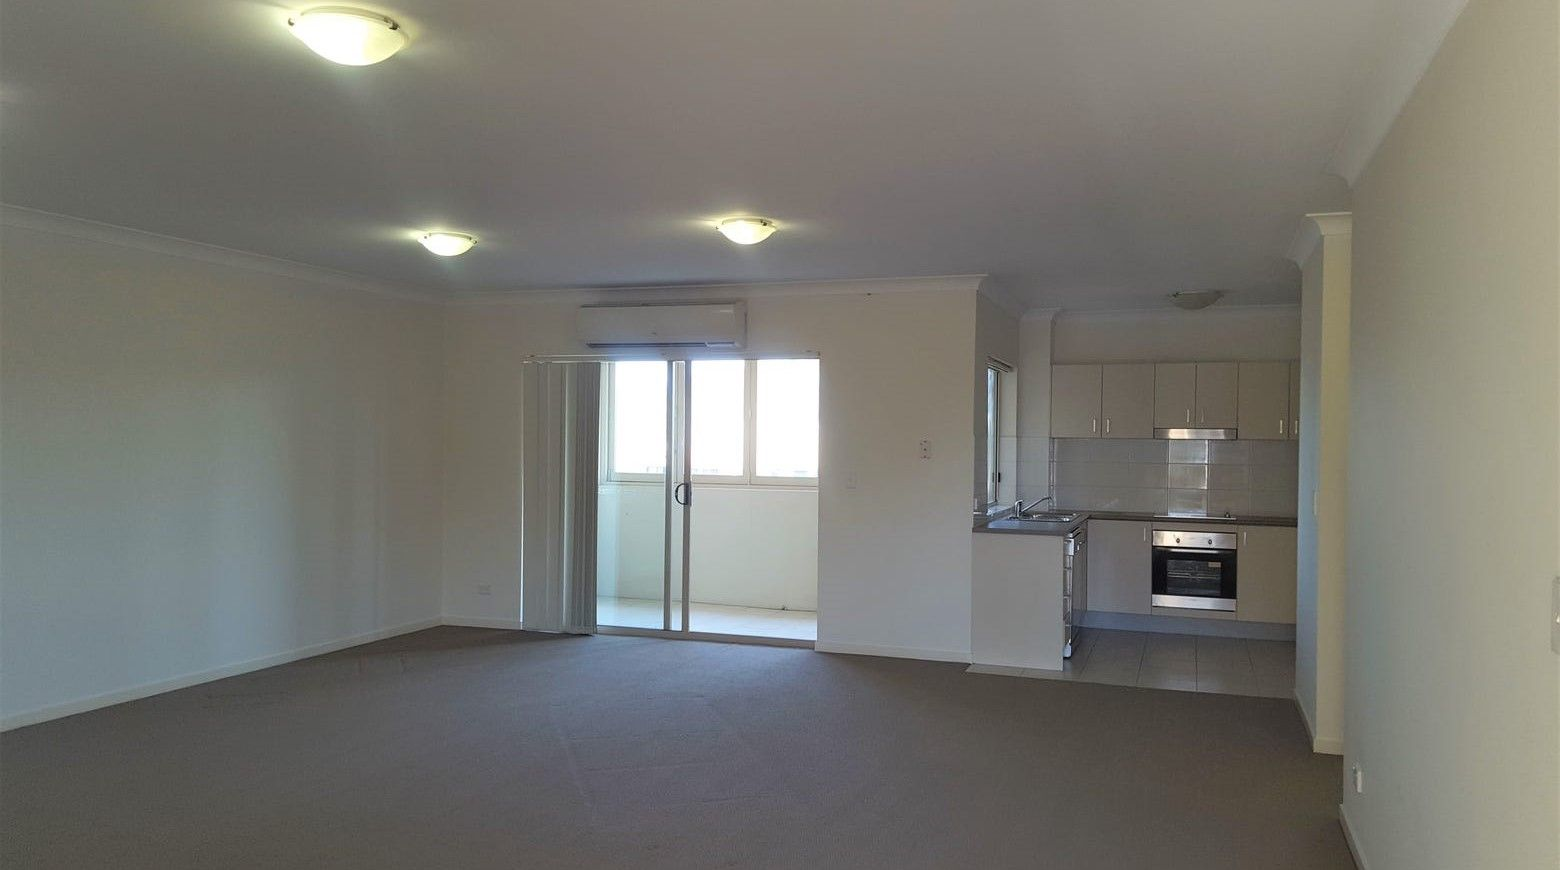 19/12-14 Hawthorne Street, Beenleigh QLD 4207, Image 1